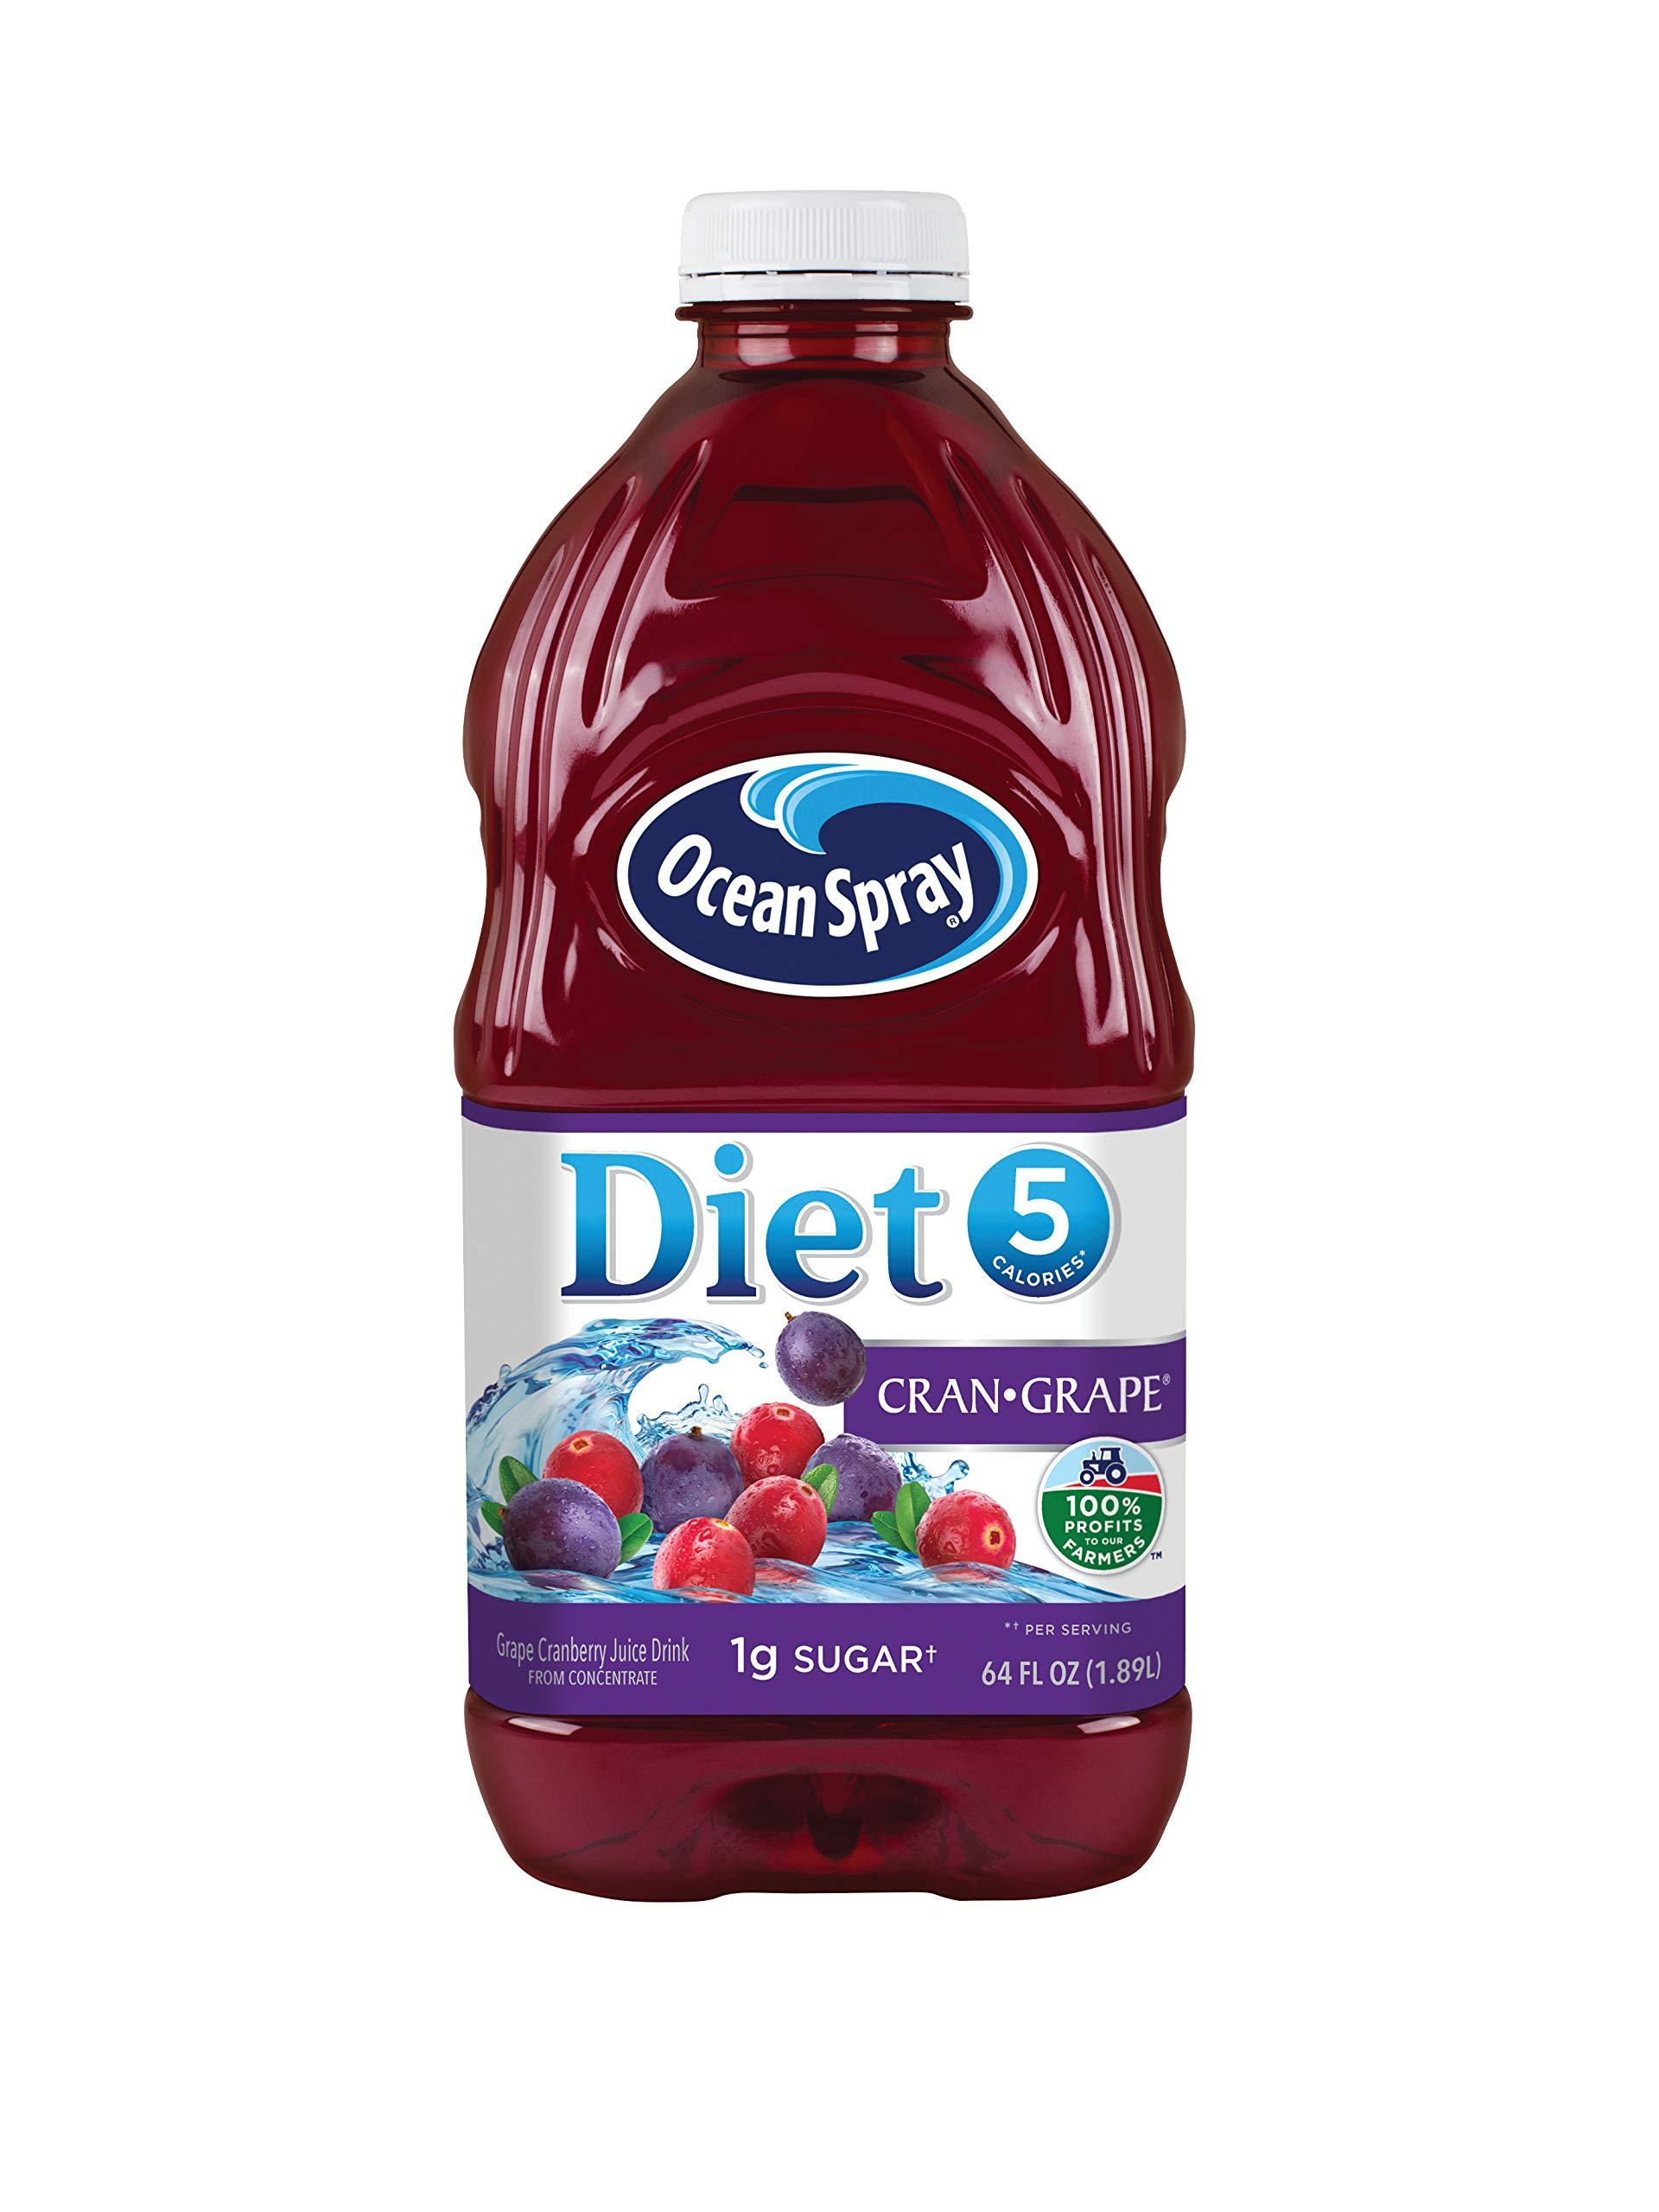 Ocean Spray Diet Cran-Grape Cranberry Grape Juice Drink, 64 Ounce Bottles (Pack of 8)